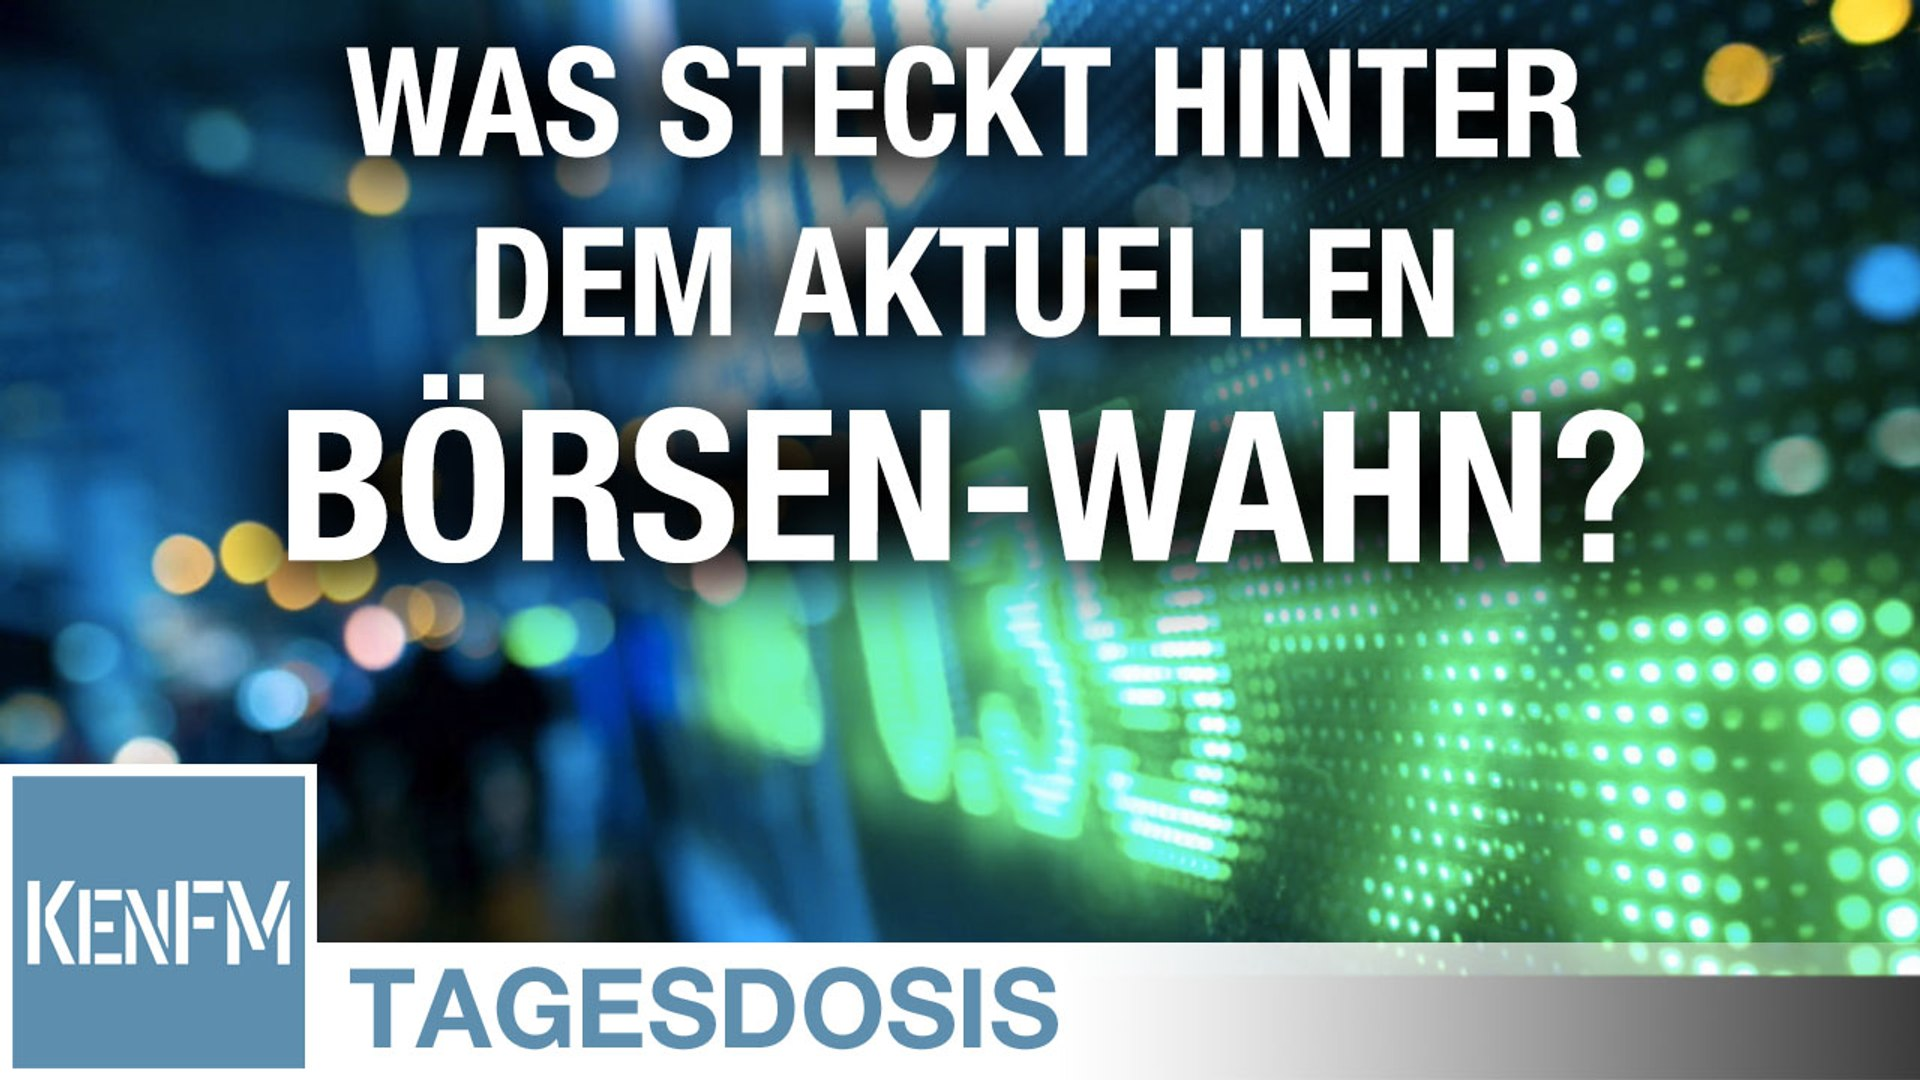 Was steckt hinter dem aktuellen Börsen-Wahn?- Tagesdosis 29.6.2020